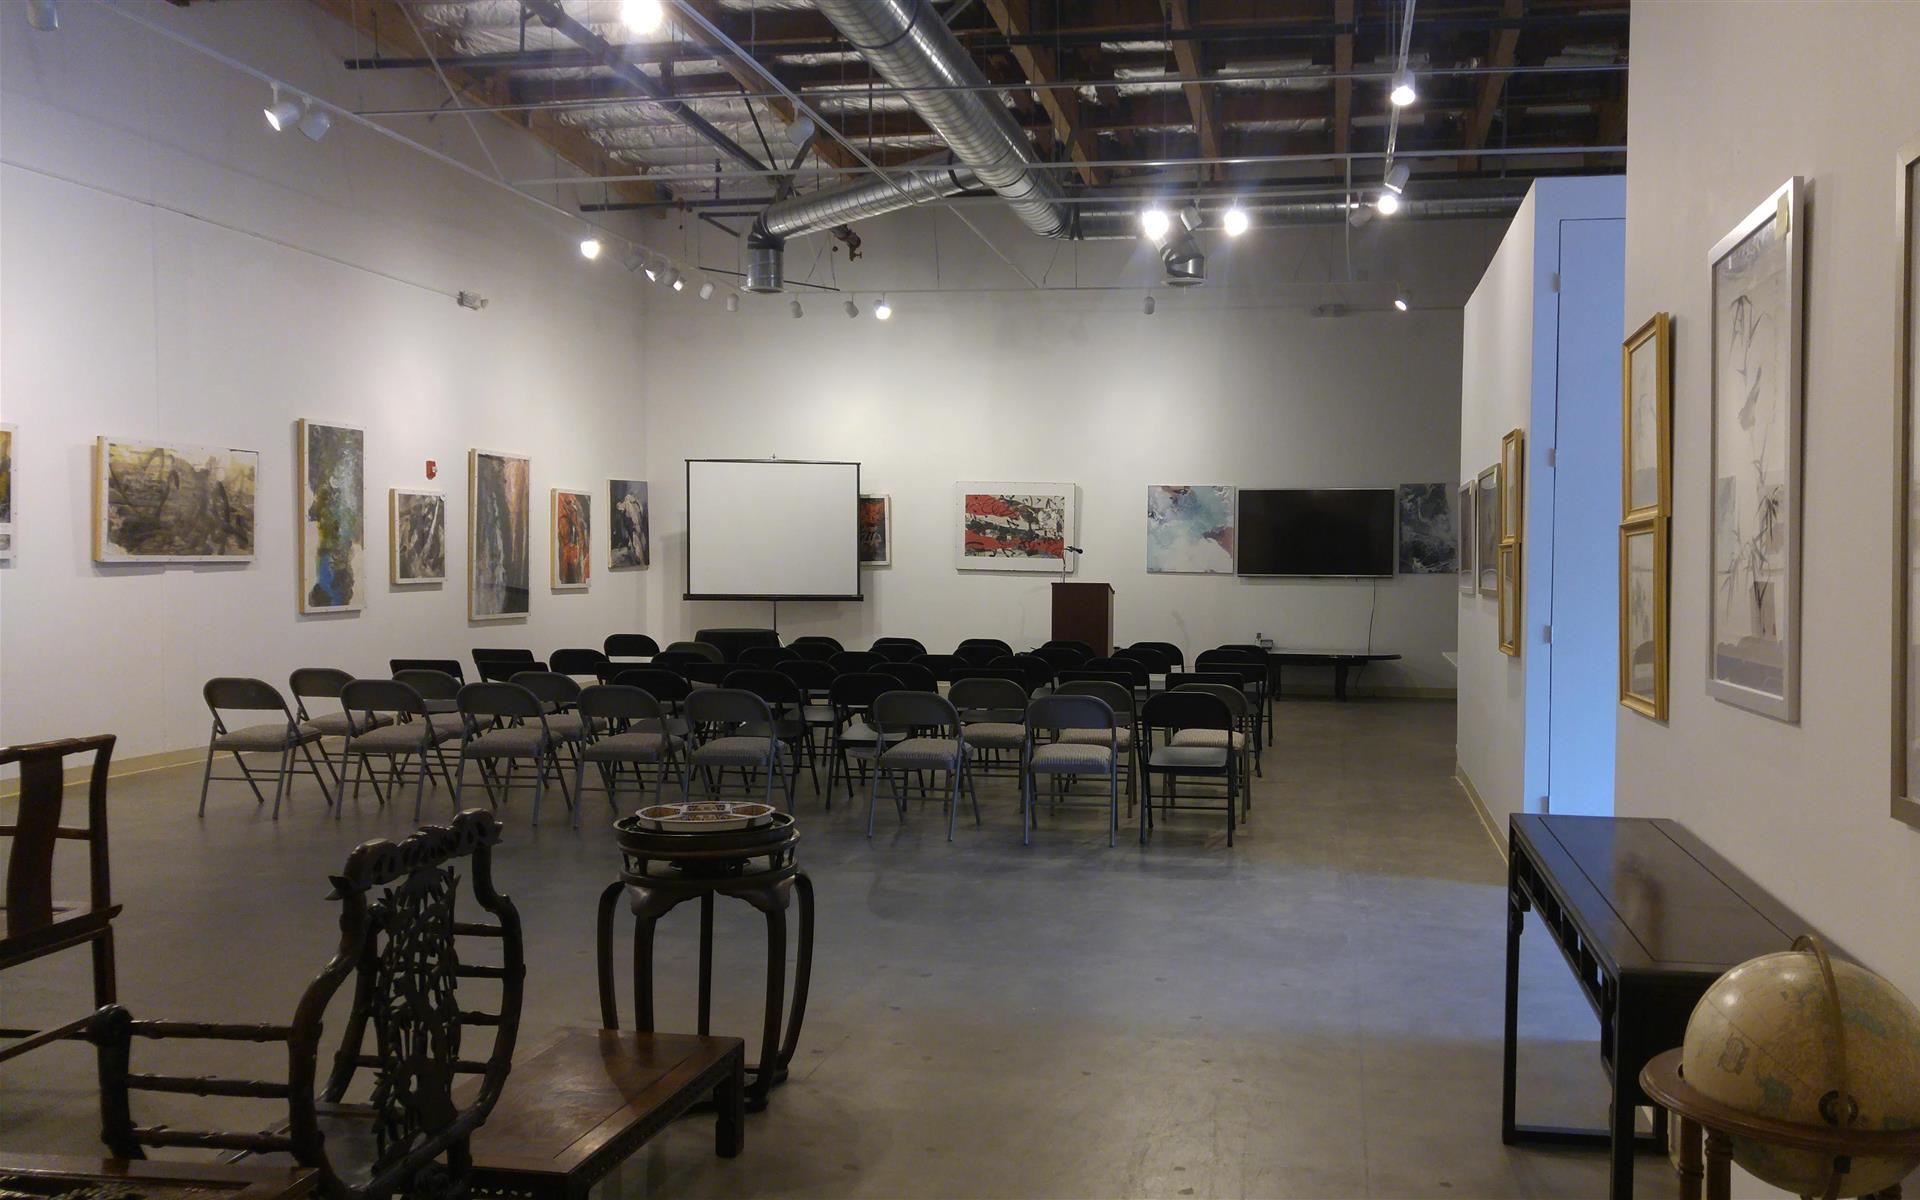 International Art Center of San Francisco LLC - International Art Center of San Francisco LLC